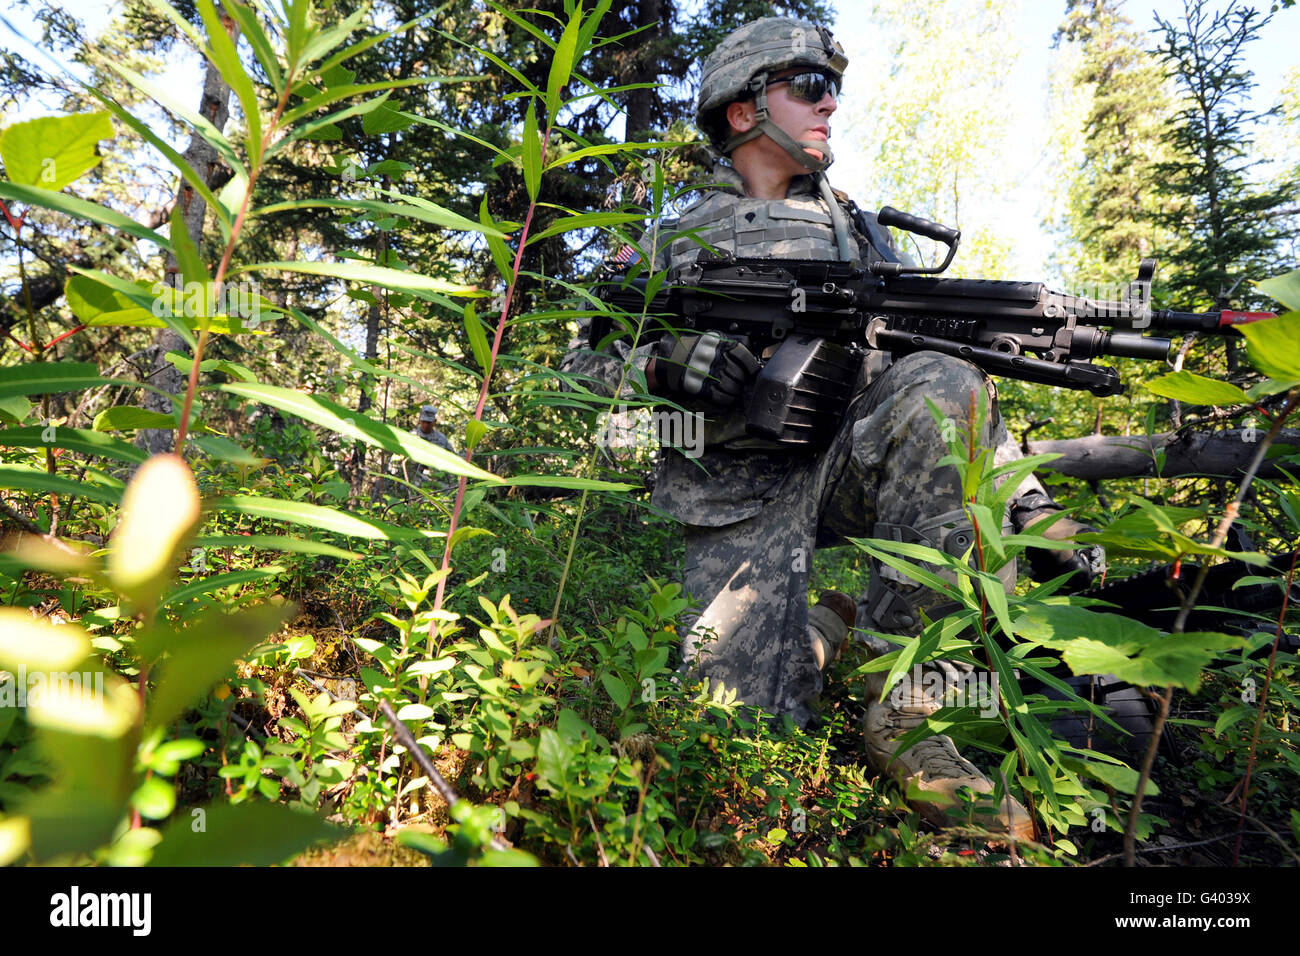 Soldier pulls security at Joint Base Elmendorf-Richardson, Alaska. - Stock Image